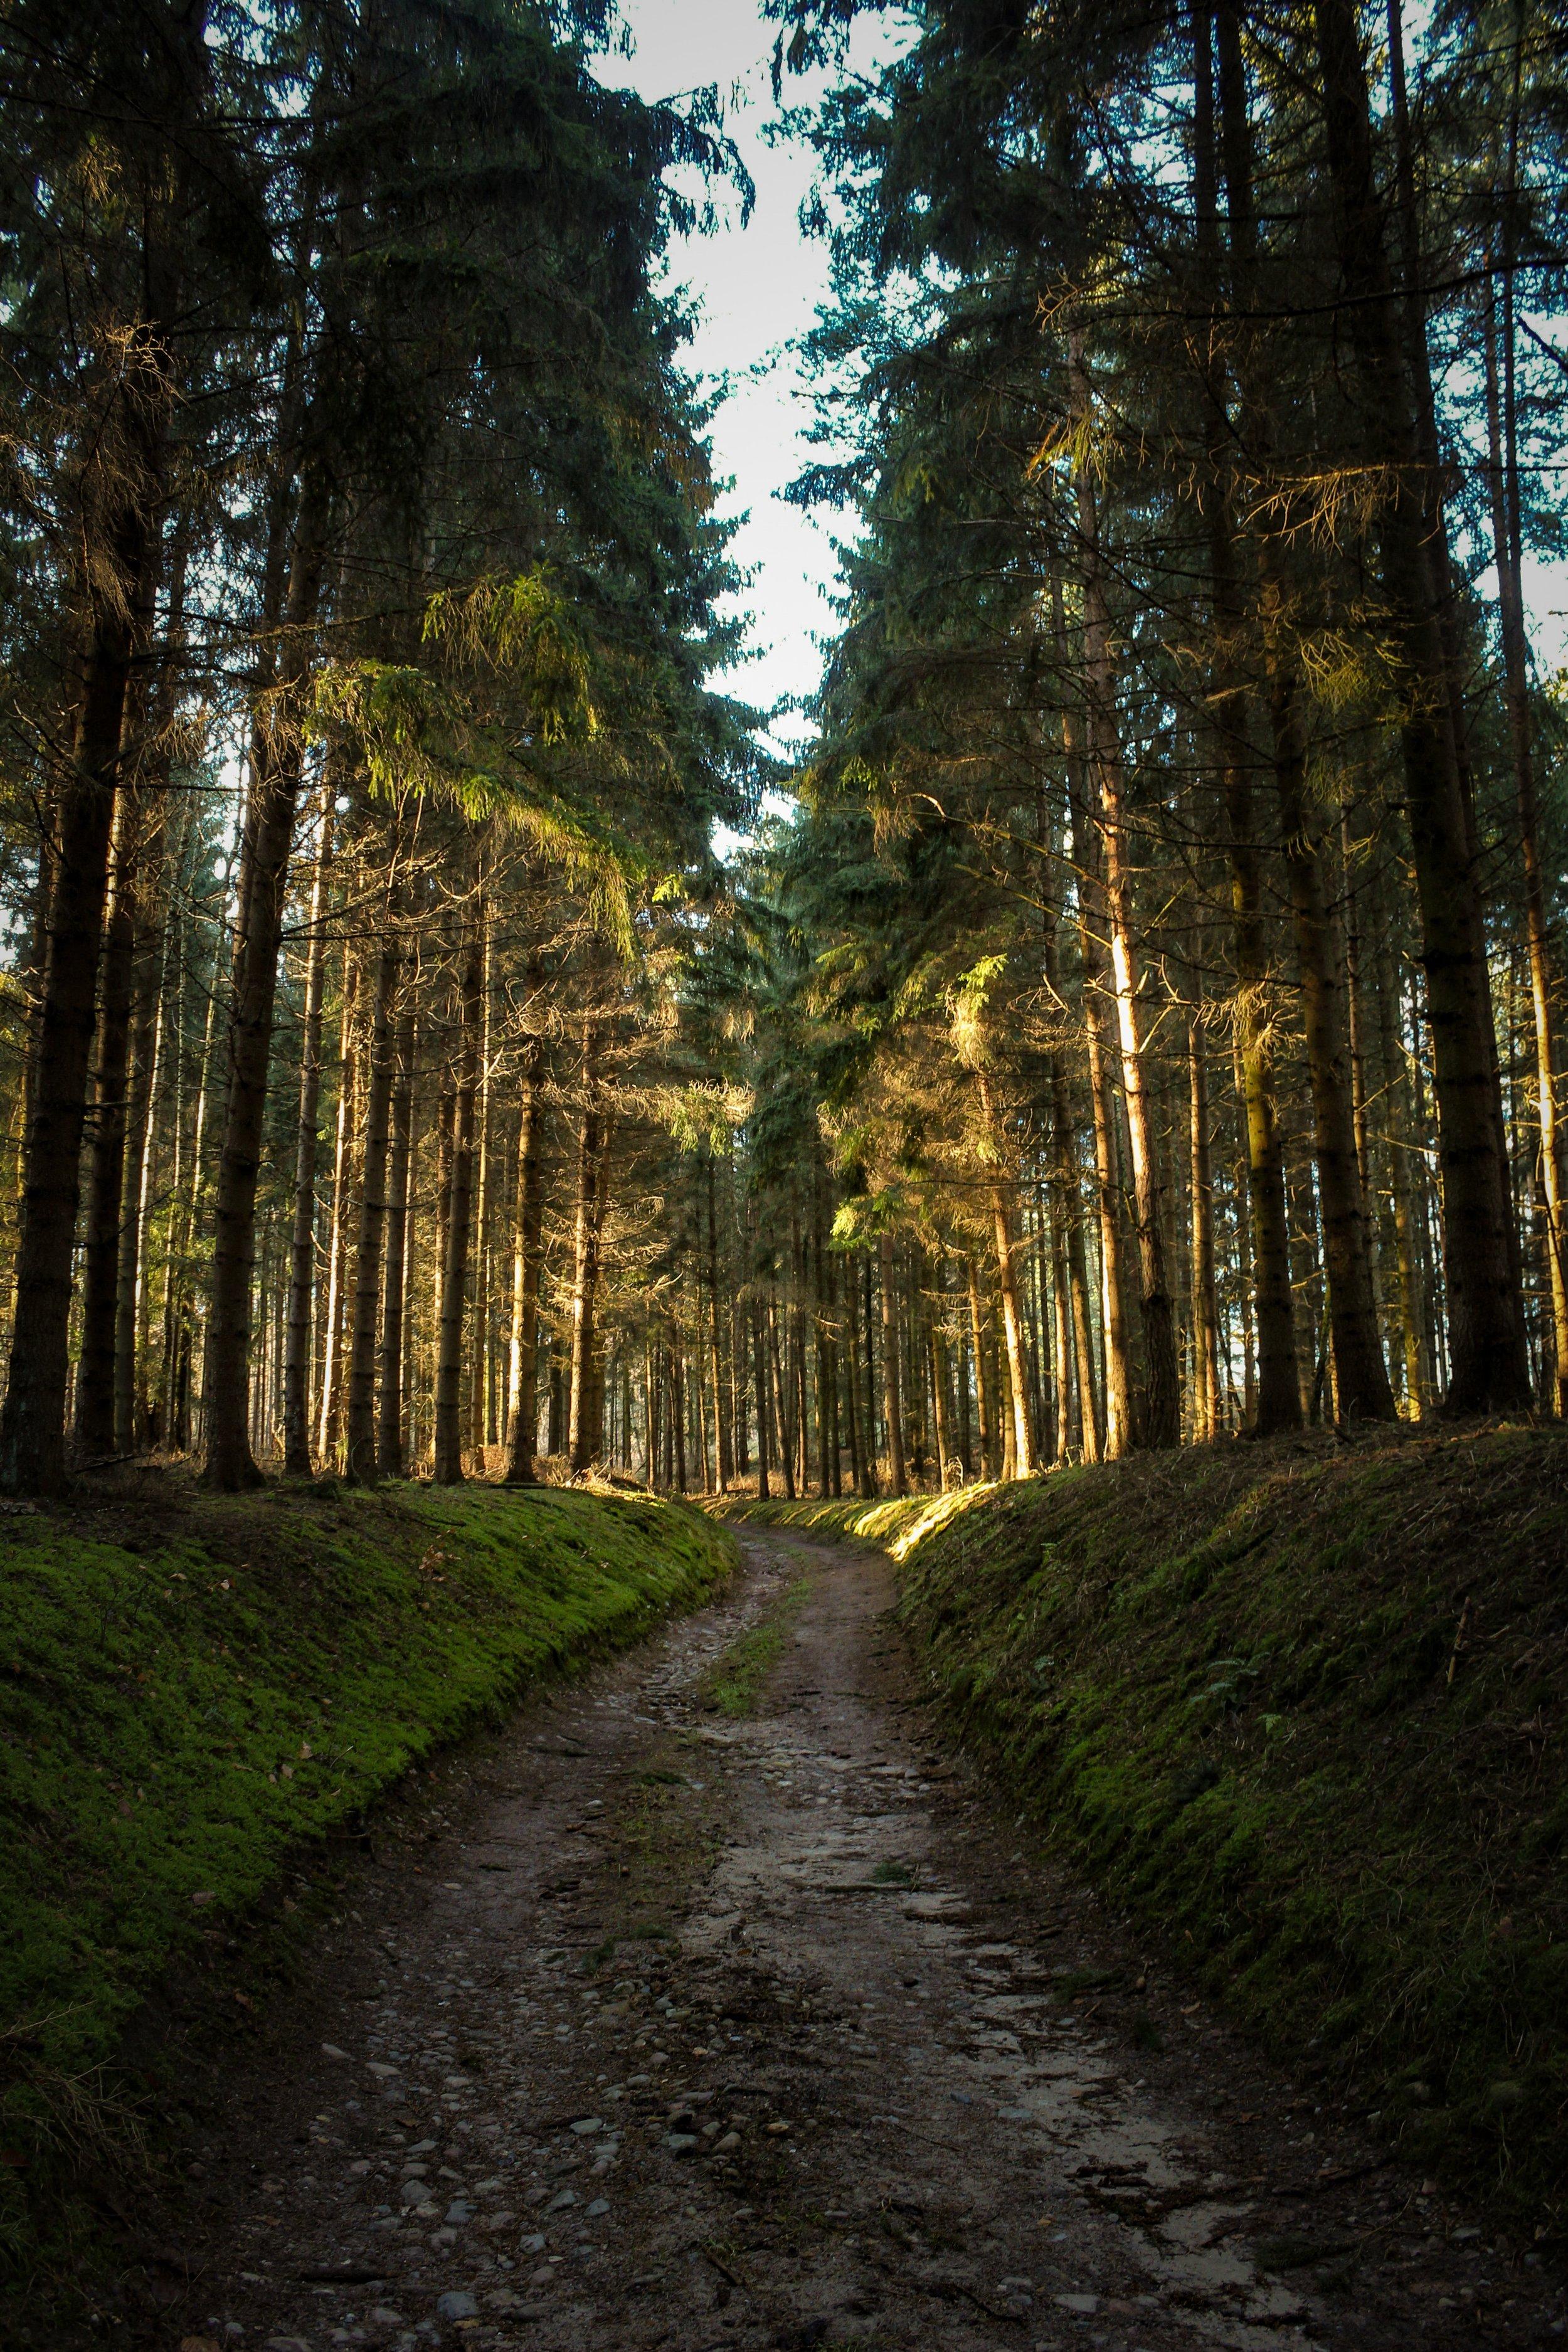 conifer-coniferous-trees-environment-2254030.jpg